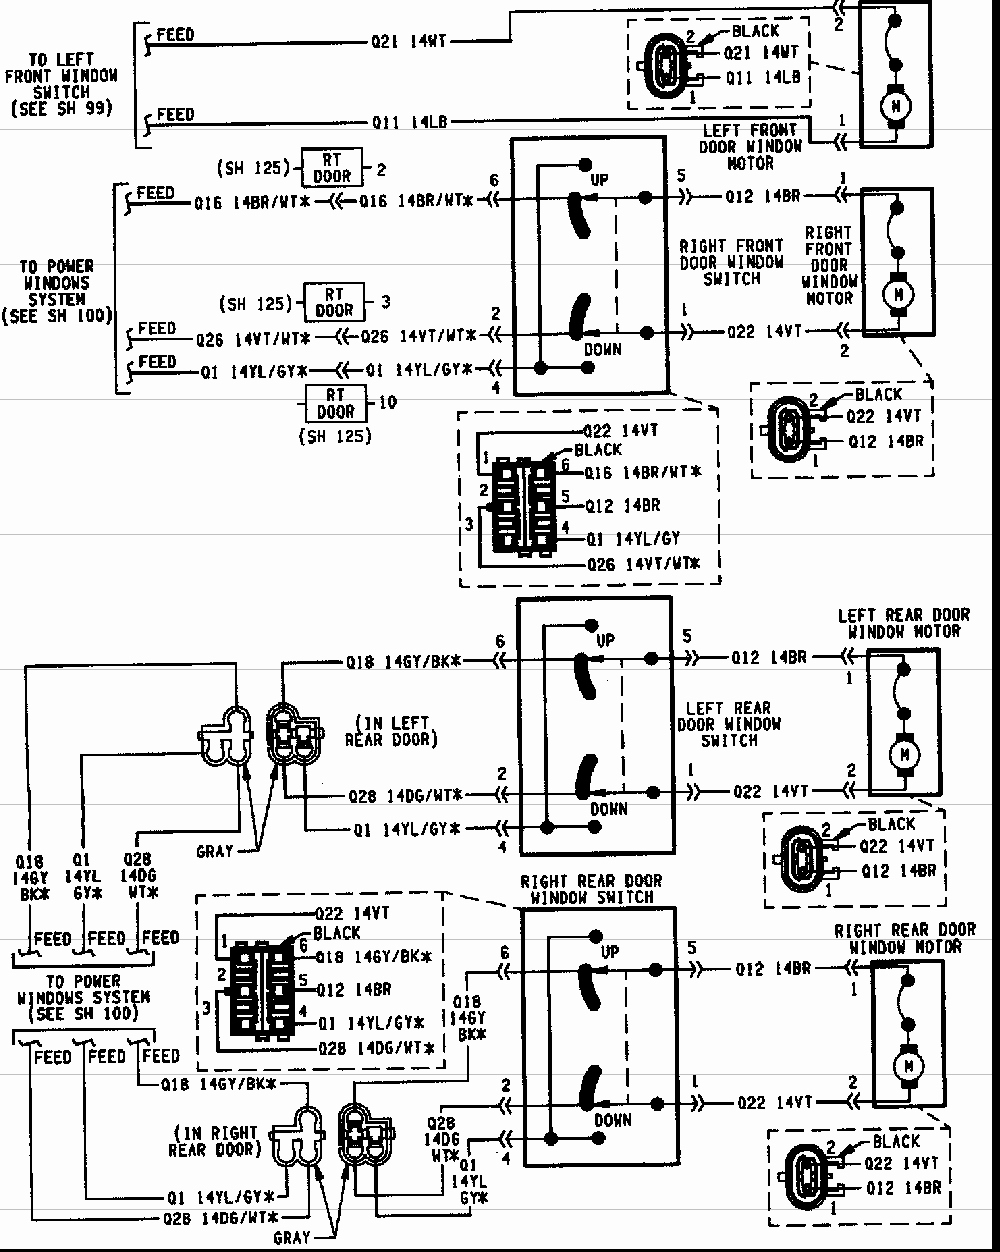 95 jeep cherokee trailer wiring